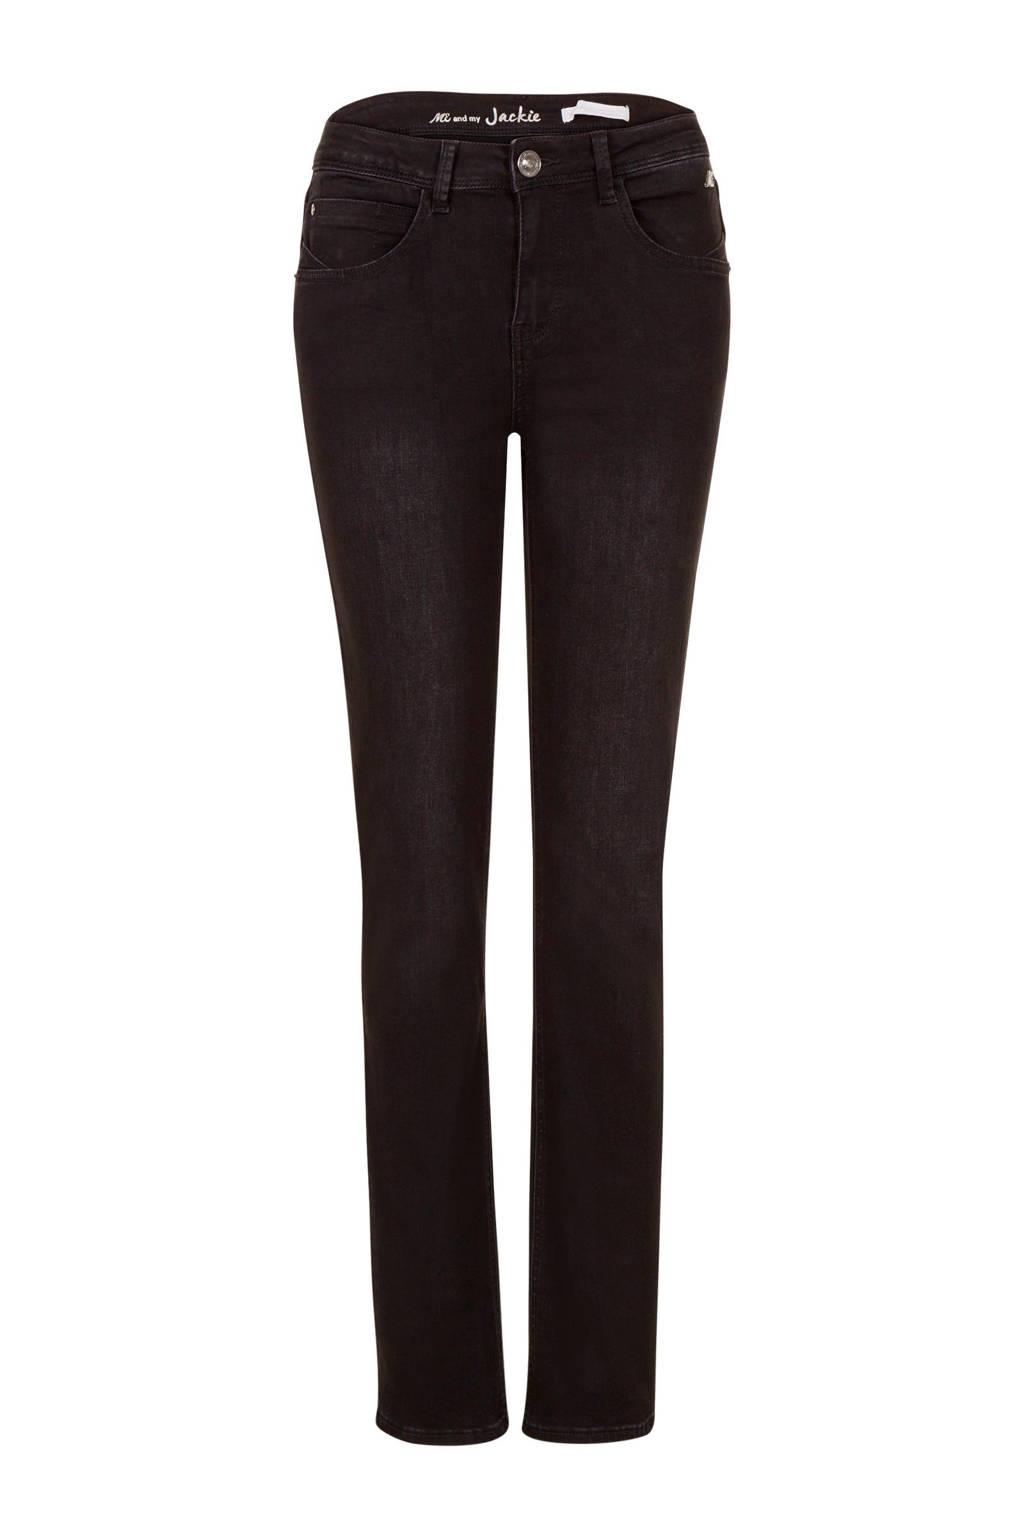 Miss Etam Regulier straight fit jeans Jackie 30 inch zwart, Zwart